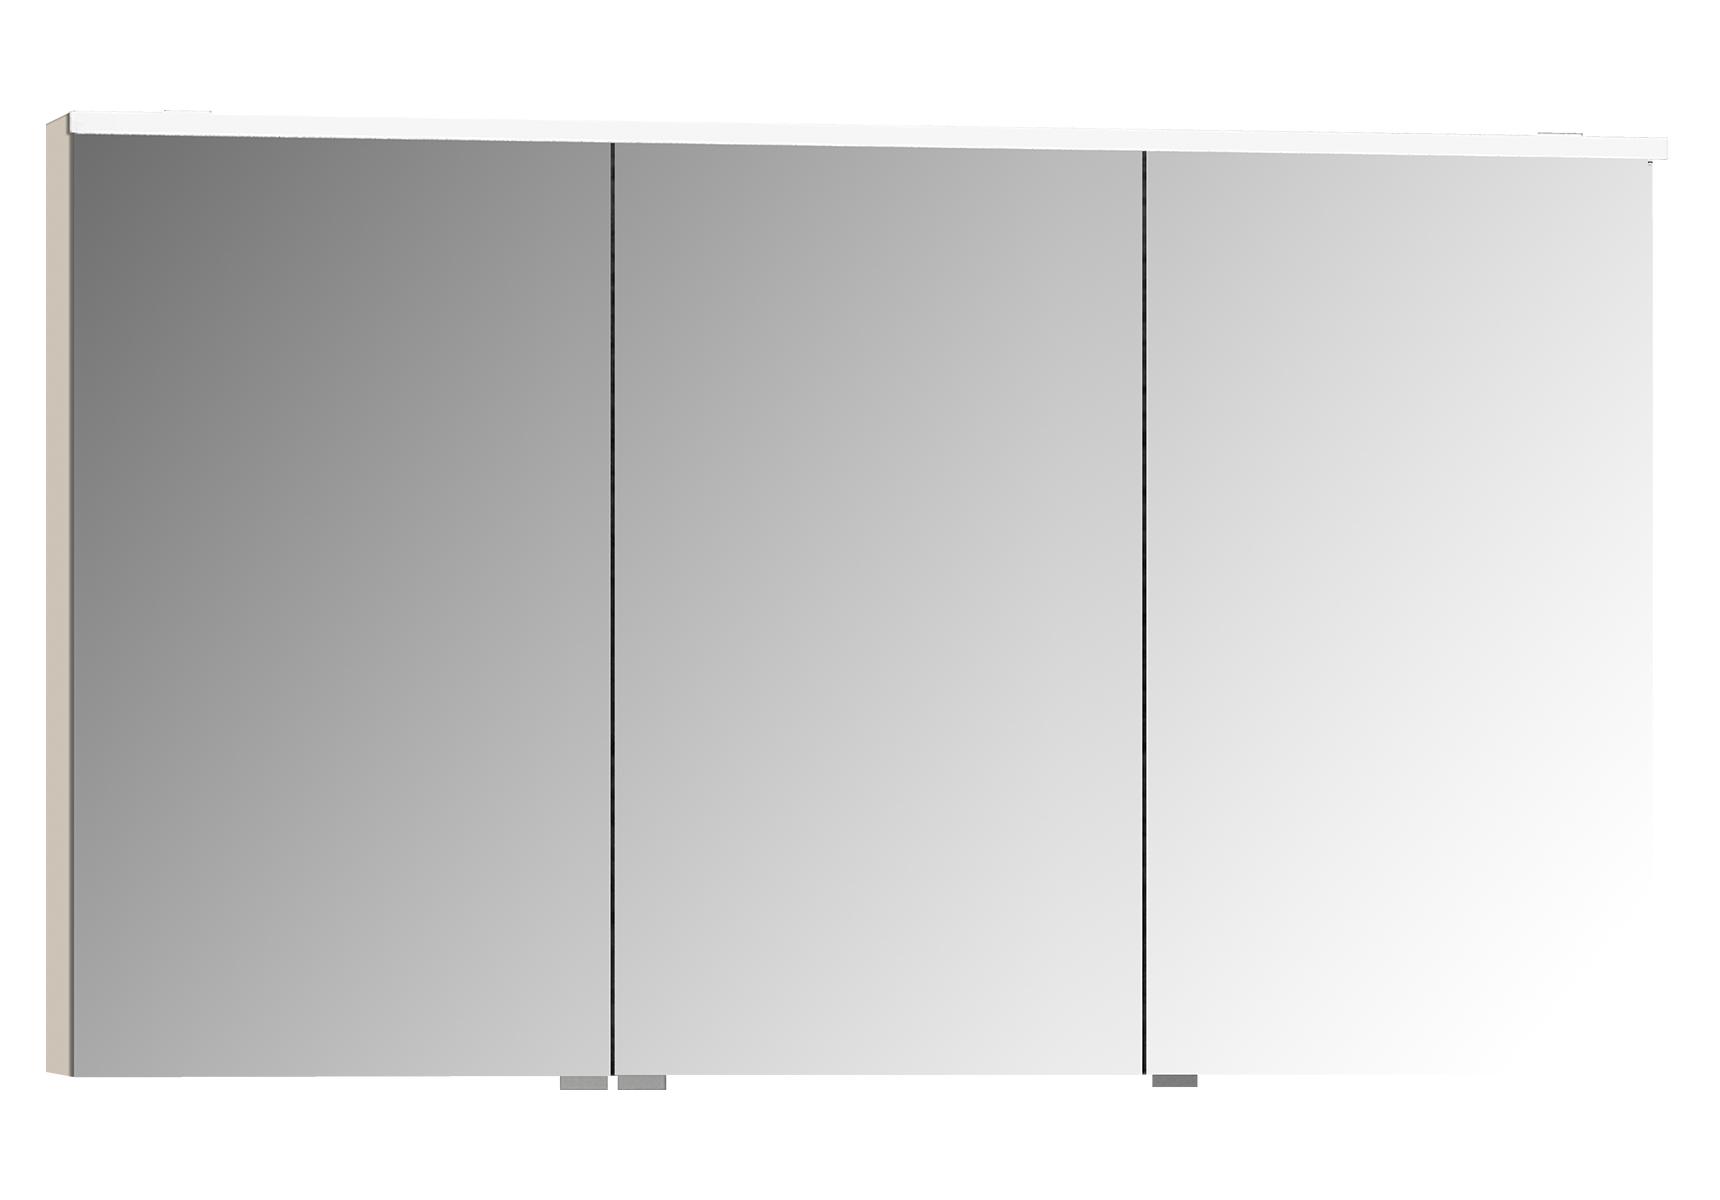 Sento Premium LED-Spiegelschrank, 120 cm, Crème Matt